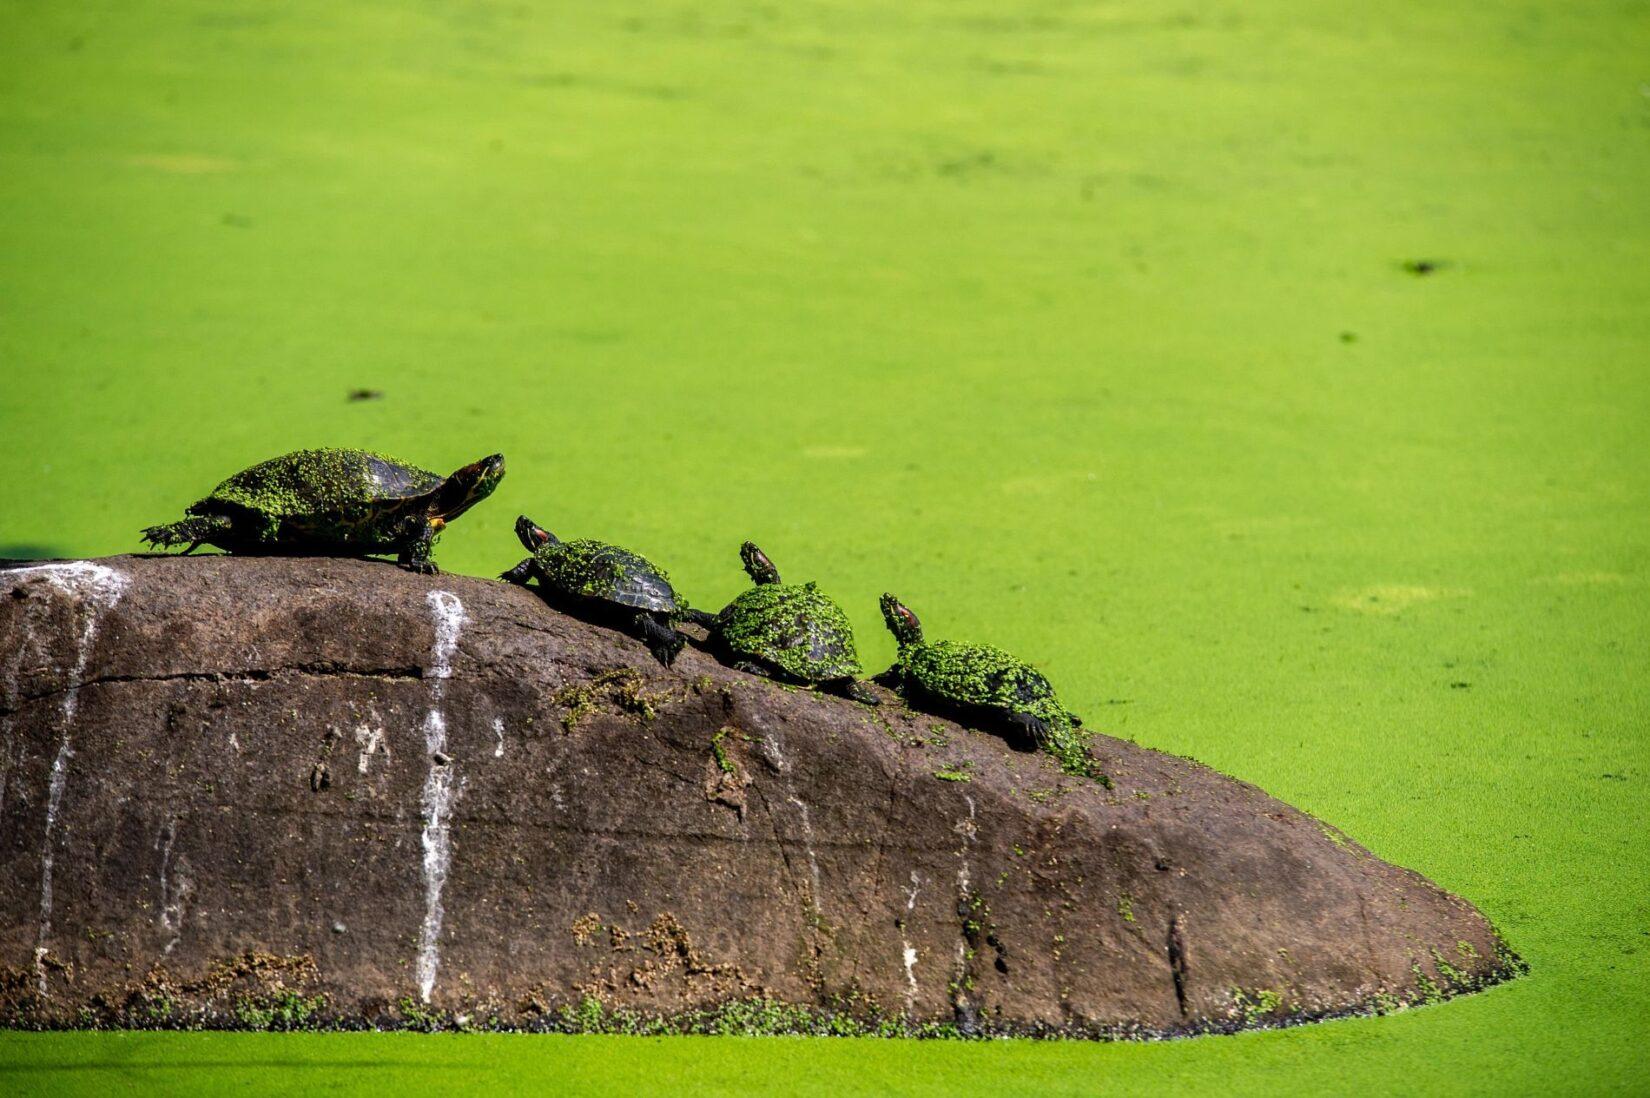 Turtles congregate on a rock amid a bright green algal bloom.